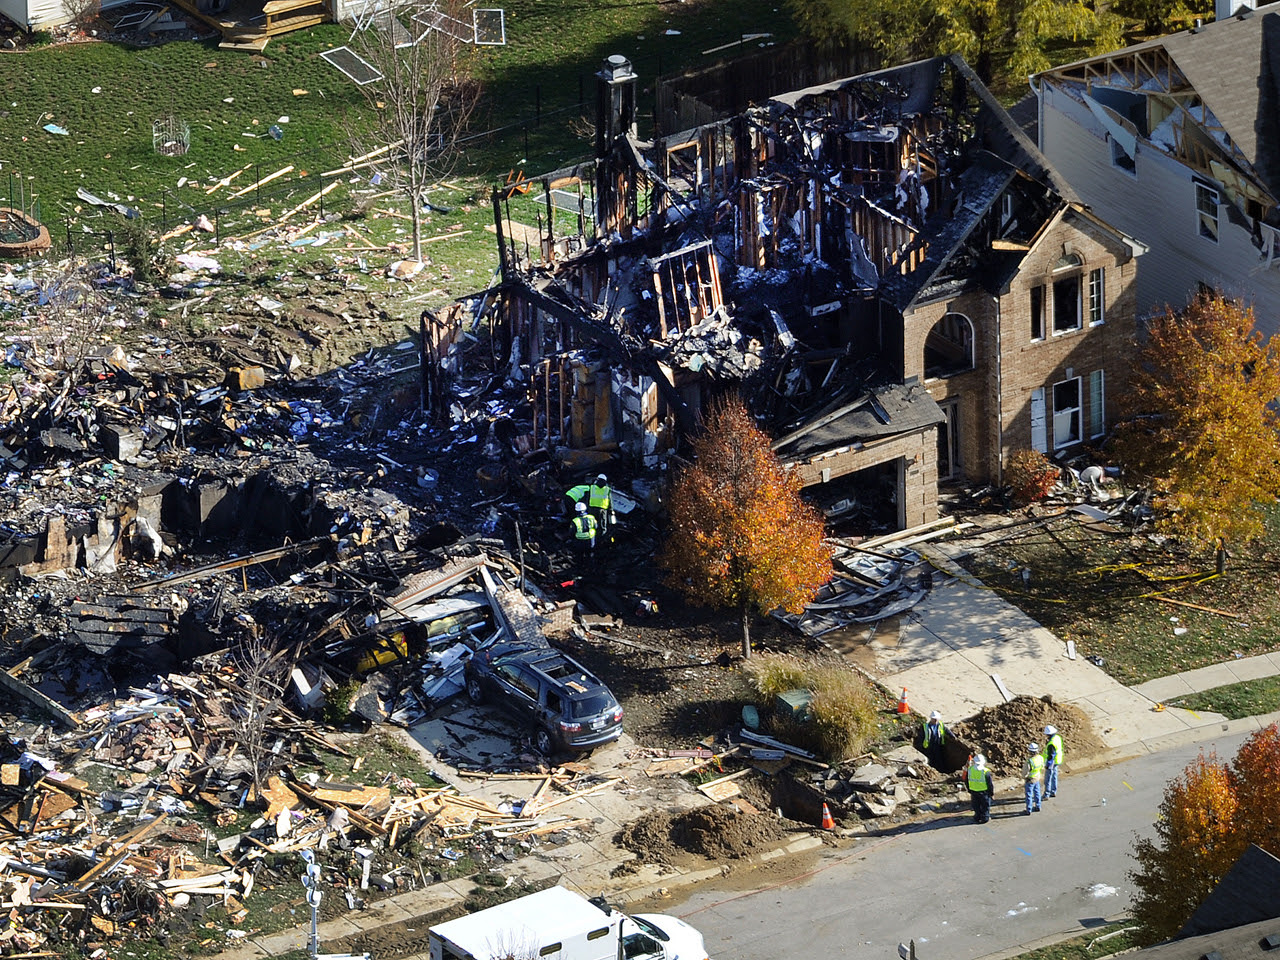 Friend testifies against Indiana house explosion suspect Mark Leonard - CBS News